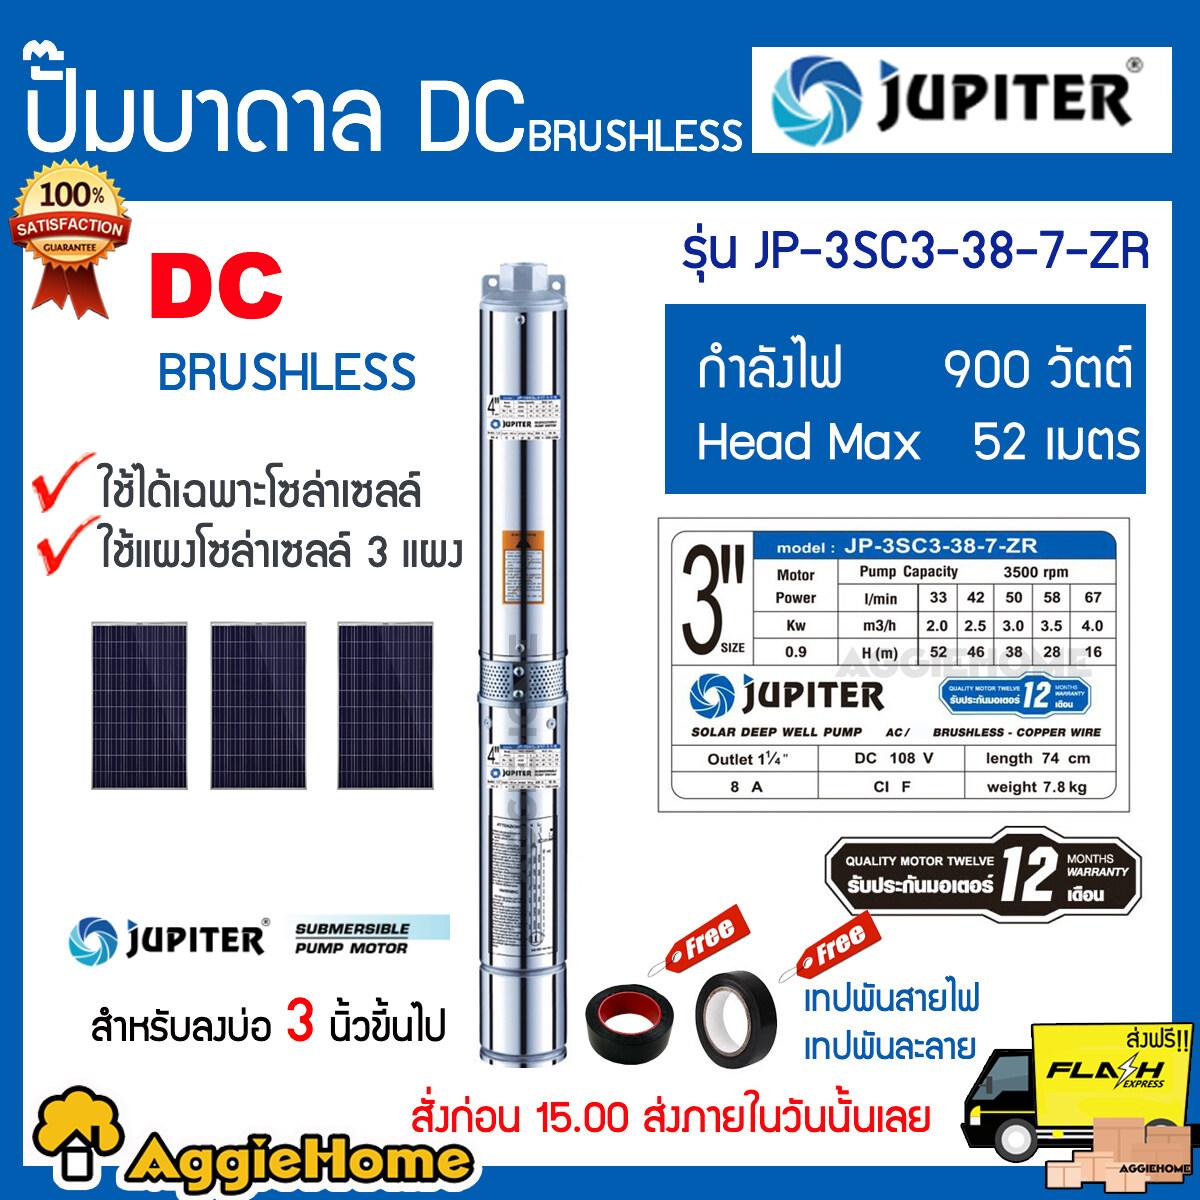 JUPITER ( ZR ) ปั๊มบาดาล บาดาล DC รุ่นJP-3SC3-38-7-ZR 900วัตต์ (ไม่มีกล่องคอนโทรล ไม่รวมแผง) 11/4นิ้ว (นิ้วสอง) BRUSHLESS โซล่าเซลล์ สำหรับลงบ่อ 3นิ้วขึ้นไป ฟรีเทปพันละลาย เทปพันลายไฟ ซัมเมิส บาดาล จัดส่งฟรีKERRY